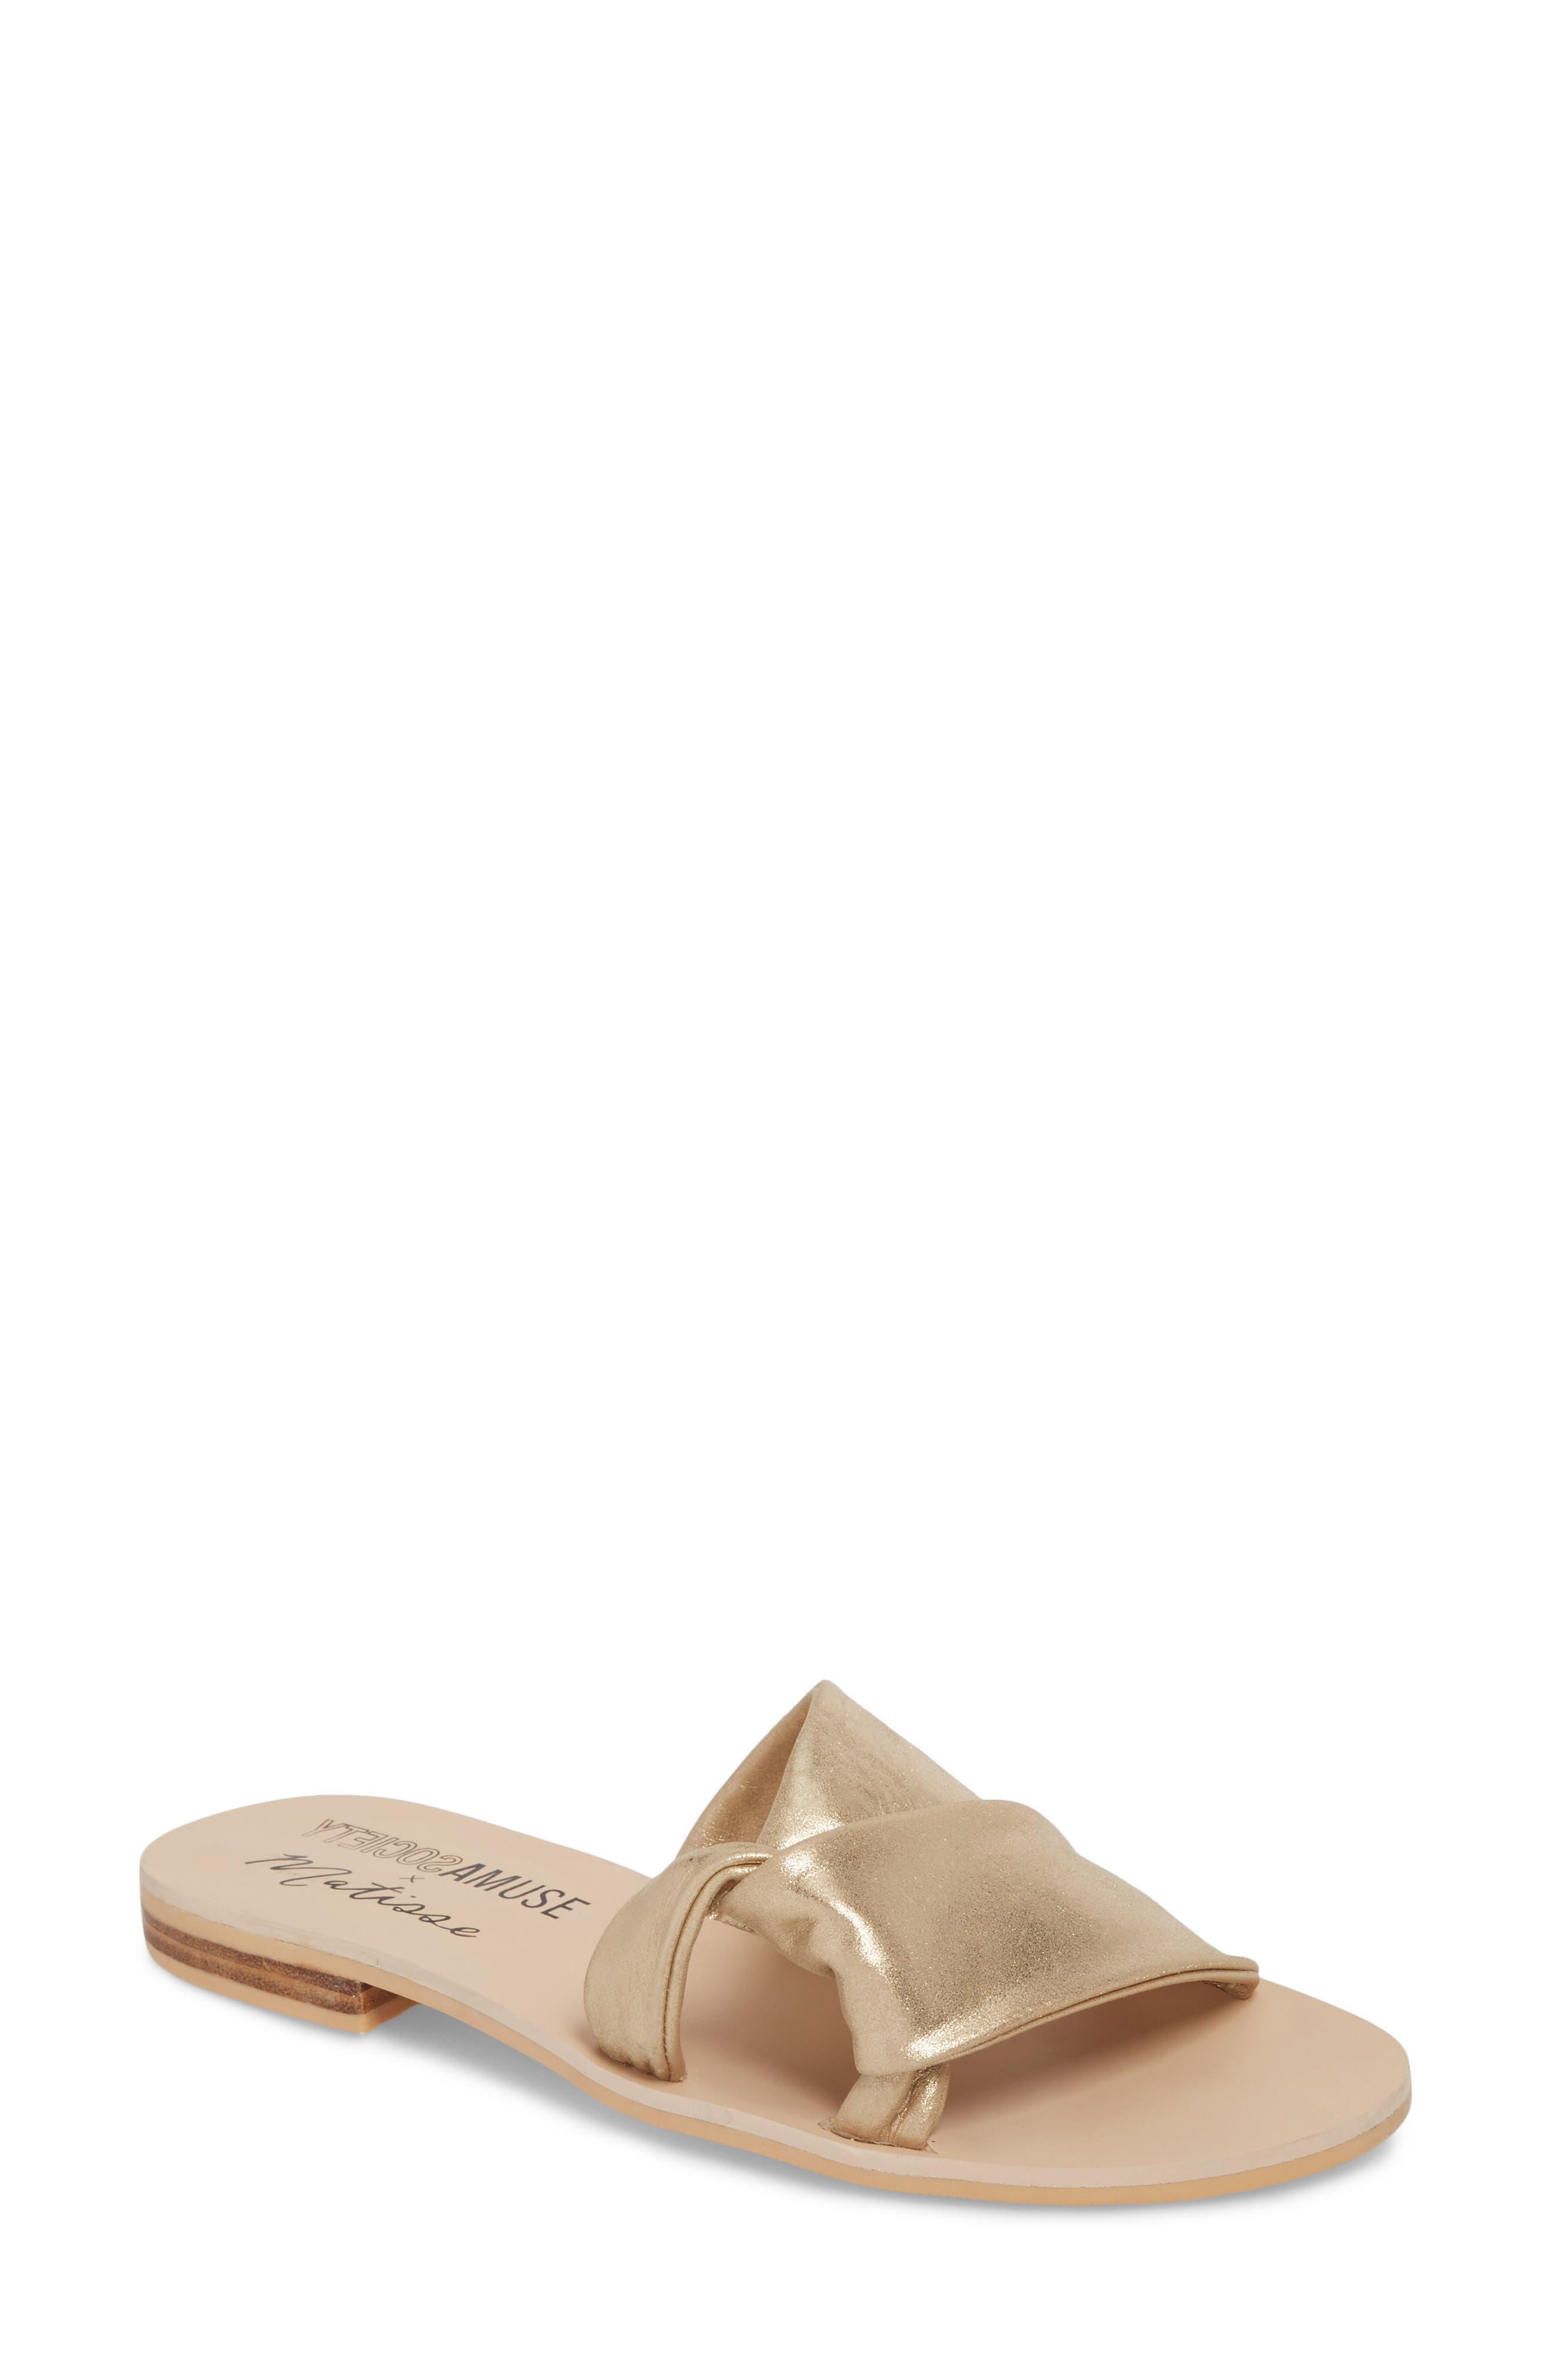 Amuse Society X Matisse Capri Slide Sandal, Metallic